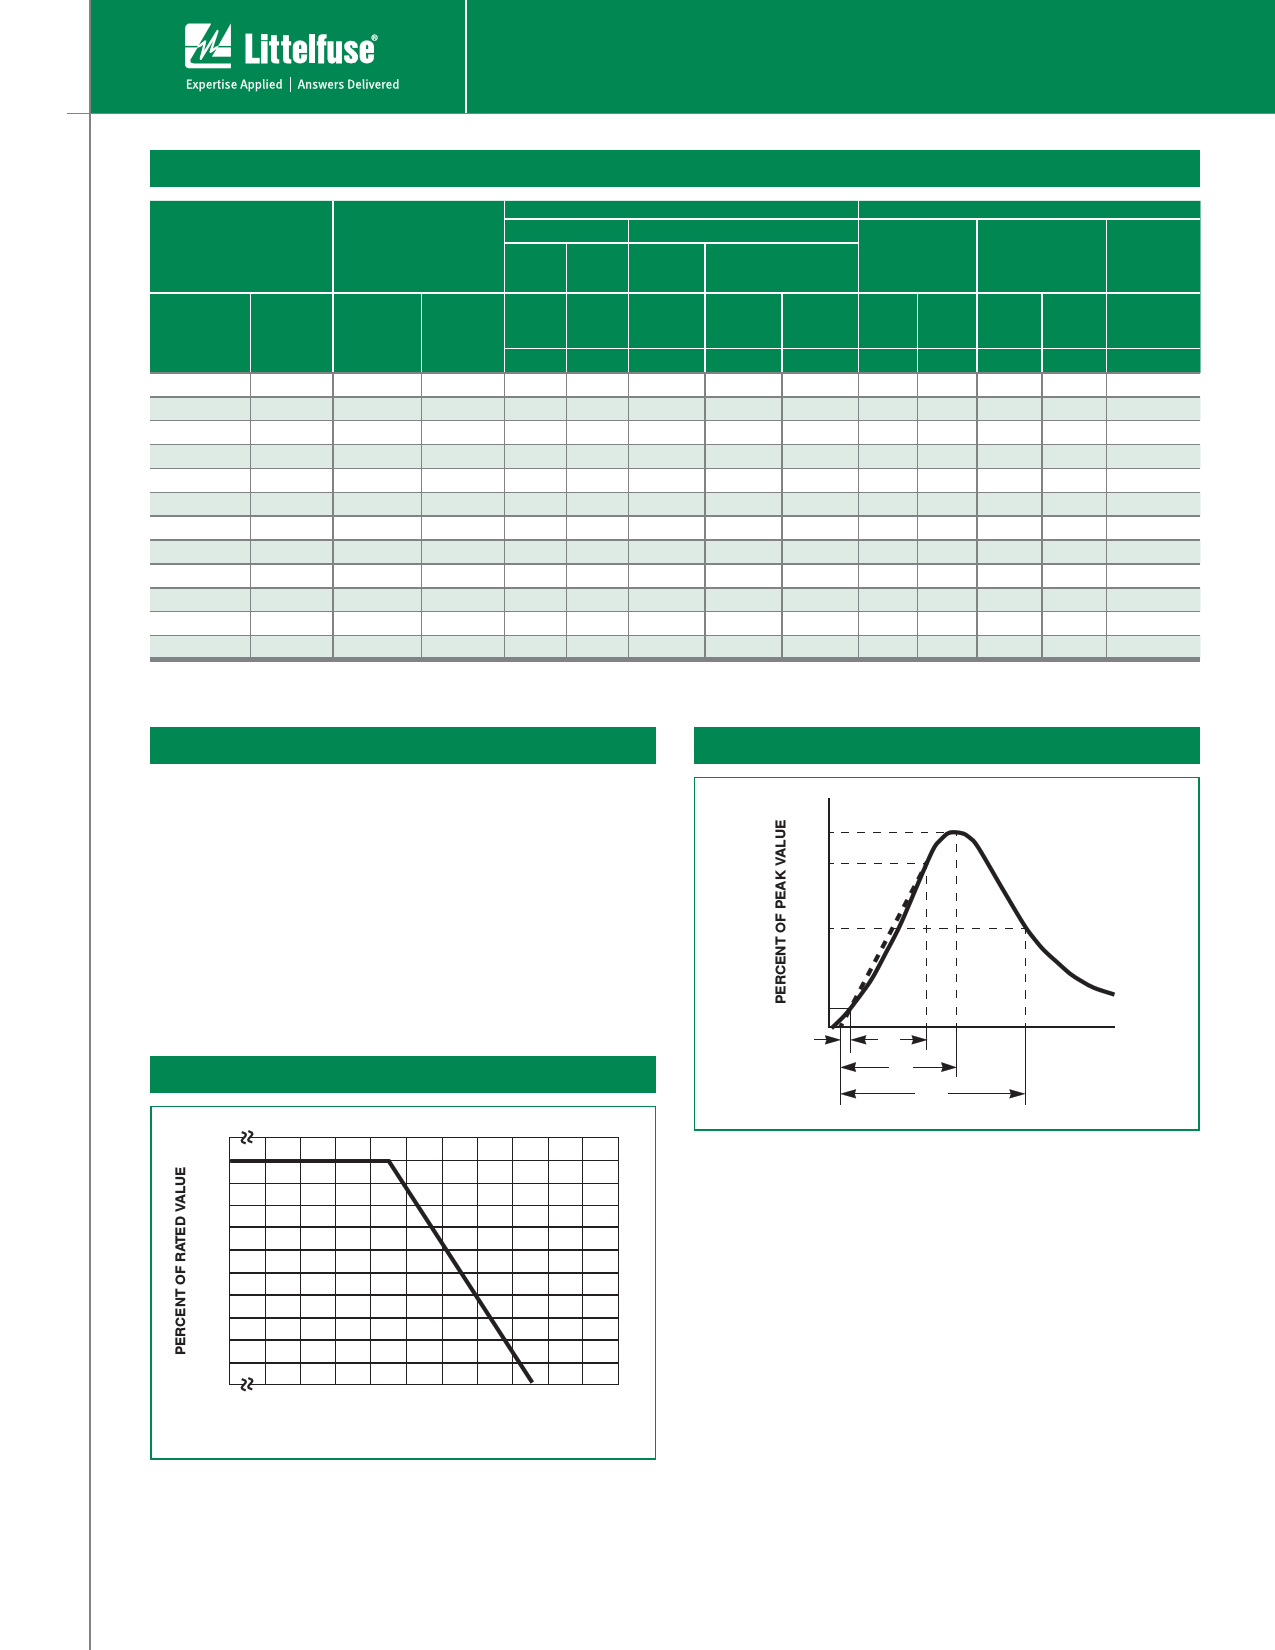 V07E140 pdf, 電子部品, 半導体, ピン配列